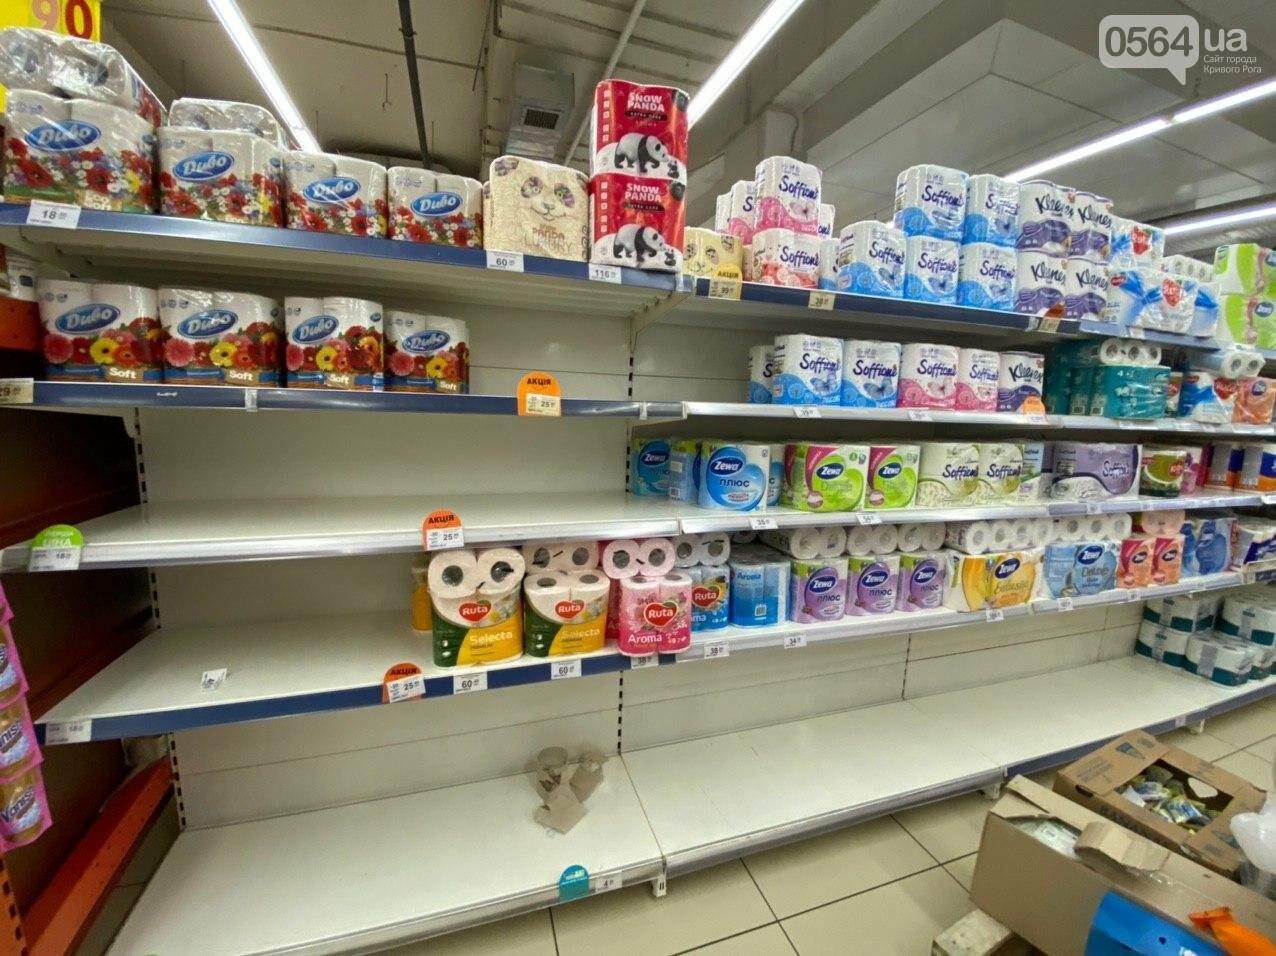 Туалетная бумага и гречка: что скупают криворожане во время карантина, - ФОТО , фото-13